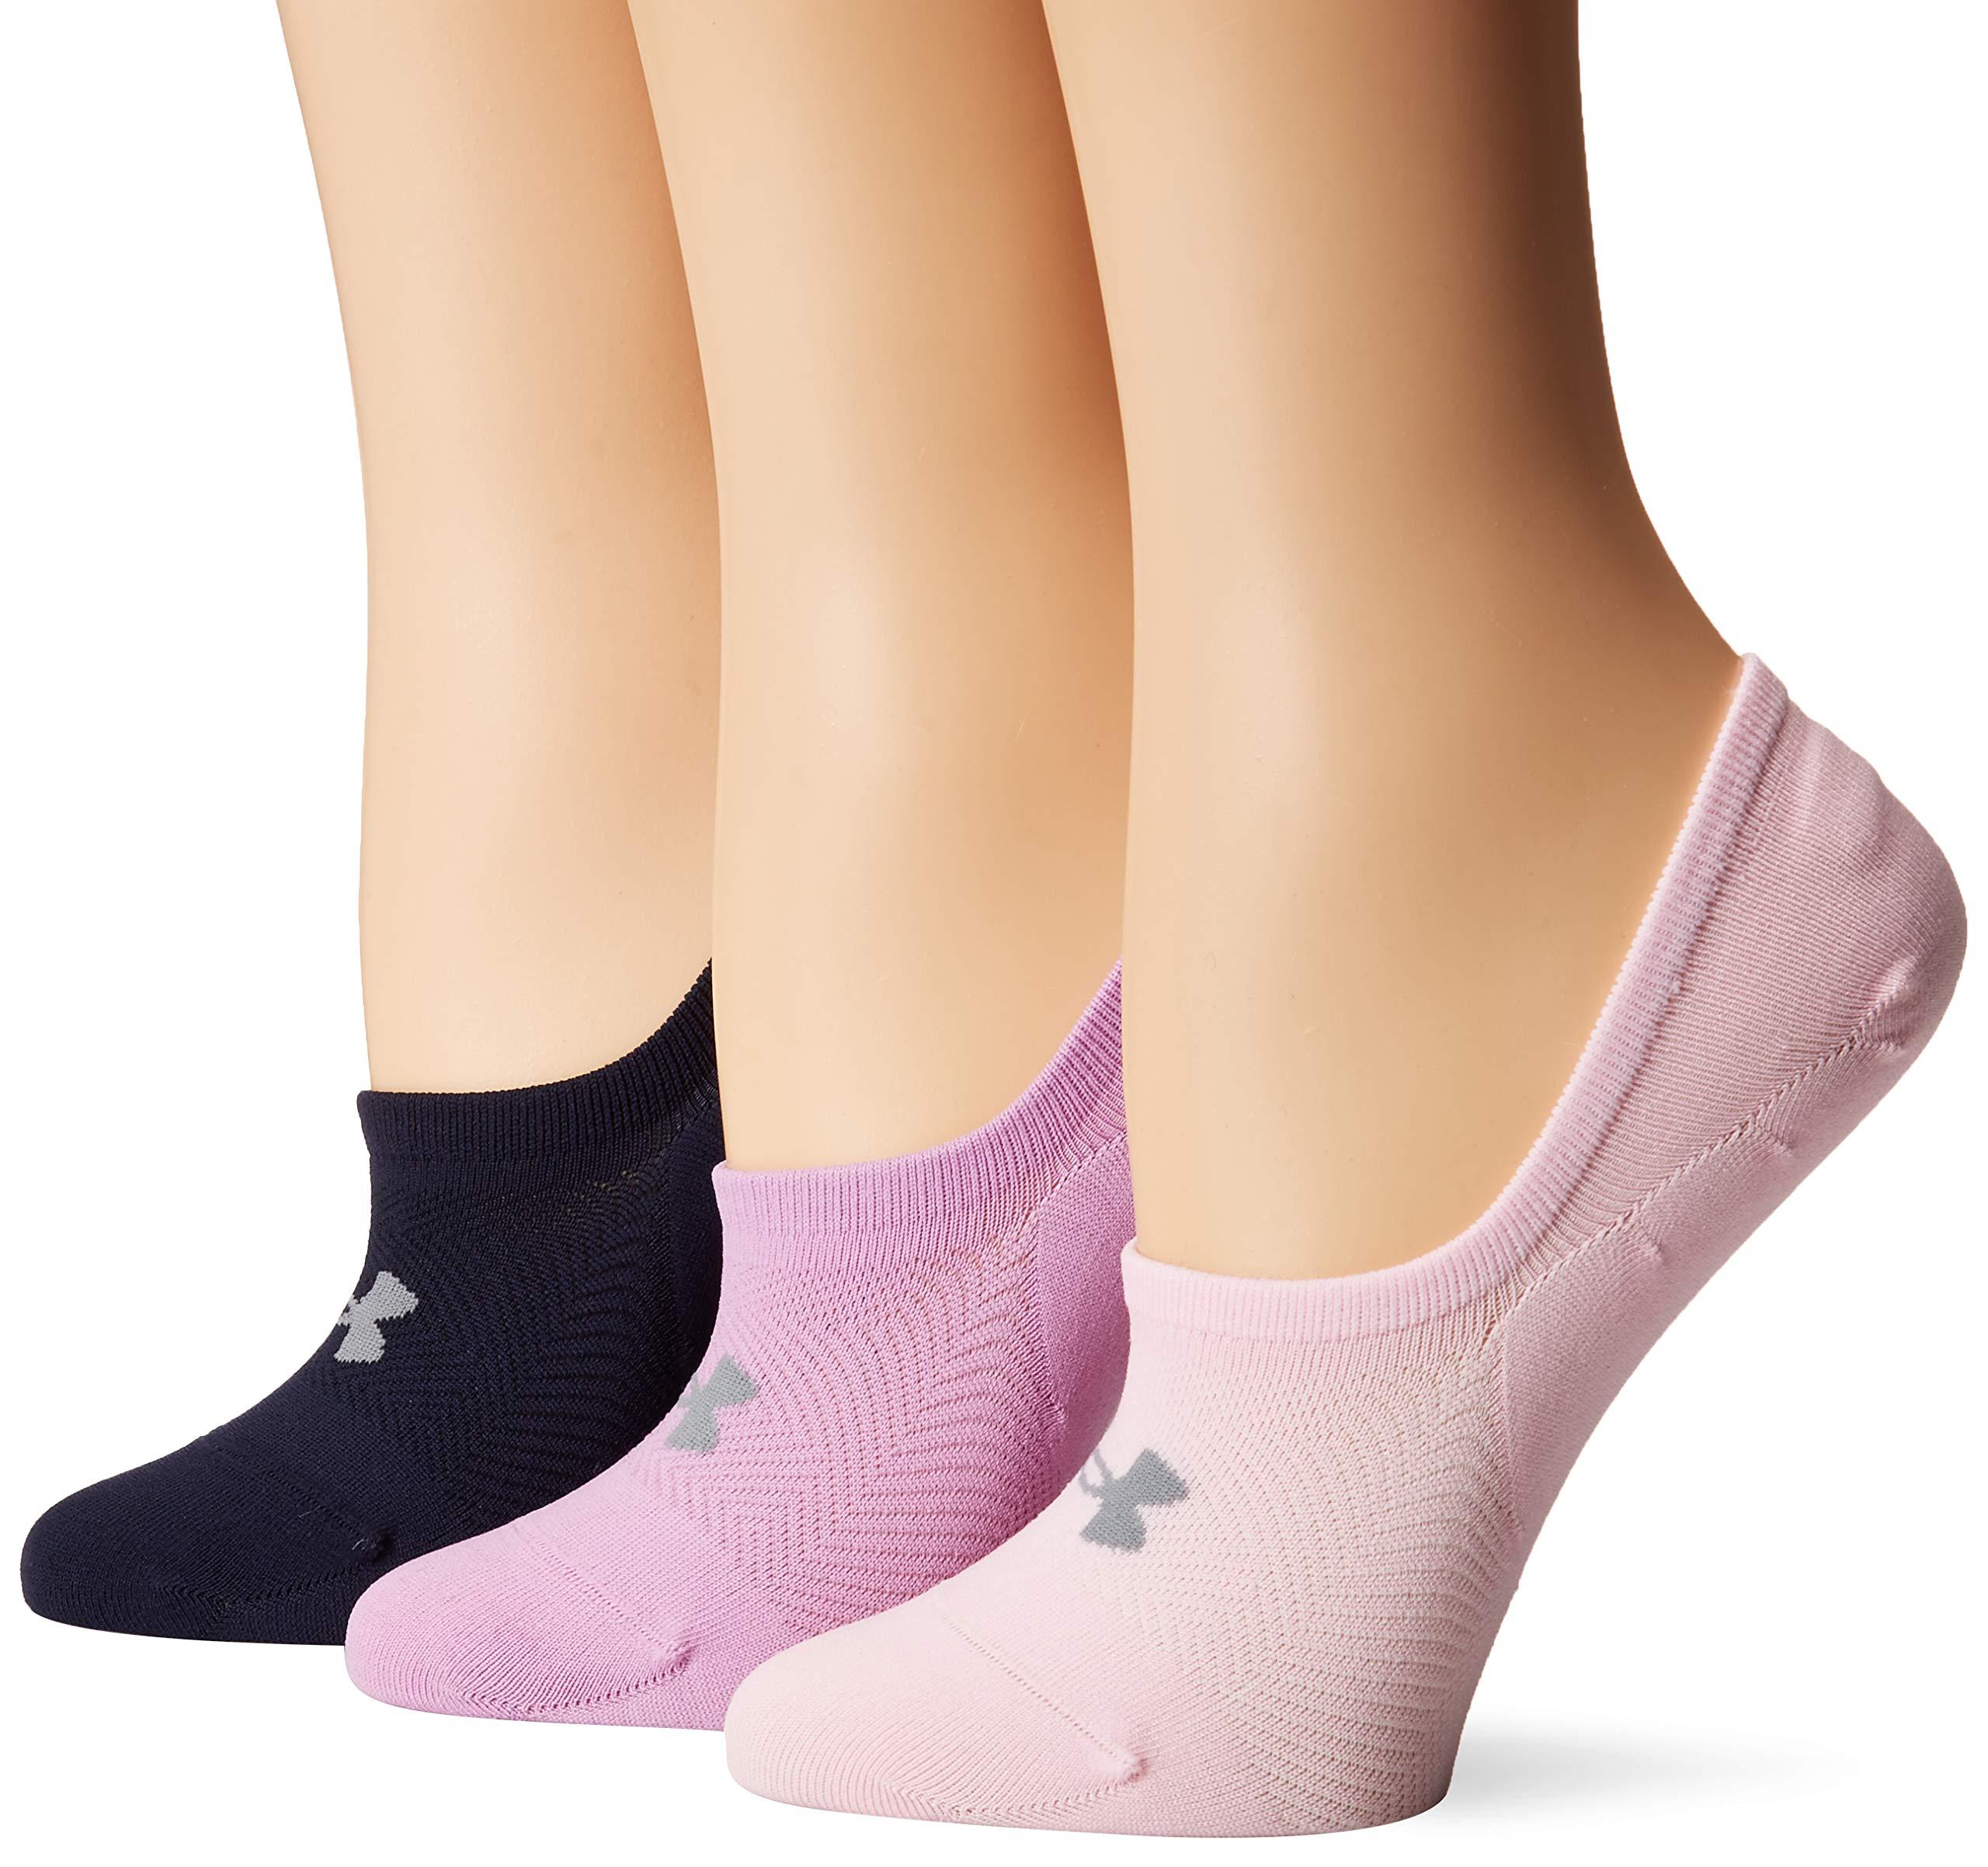 Under Armour Women's Essential Ultra Low Socks (3 Pack), Pink Foam/Assorted, Medium